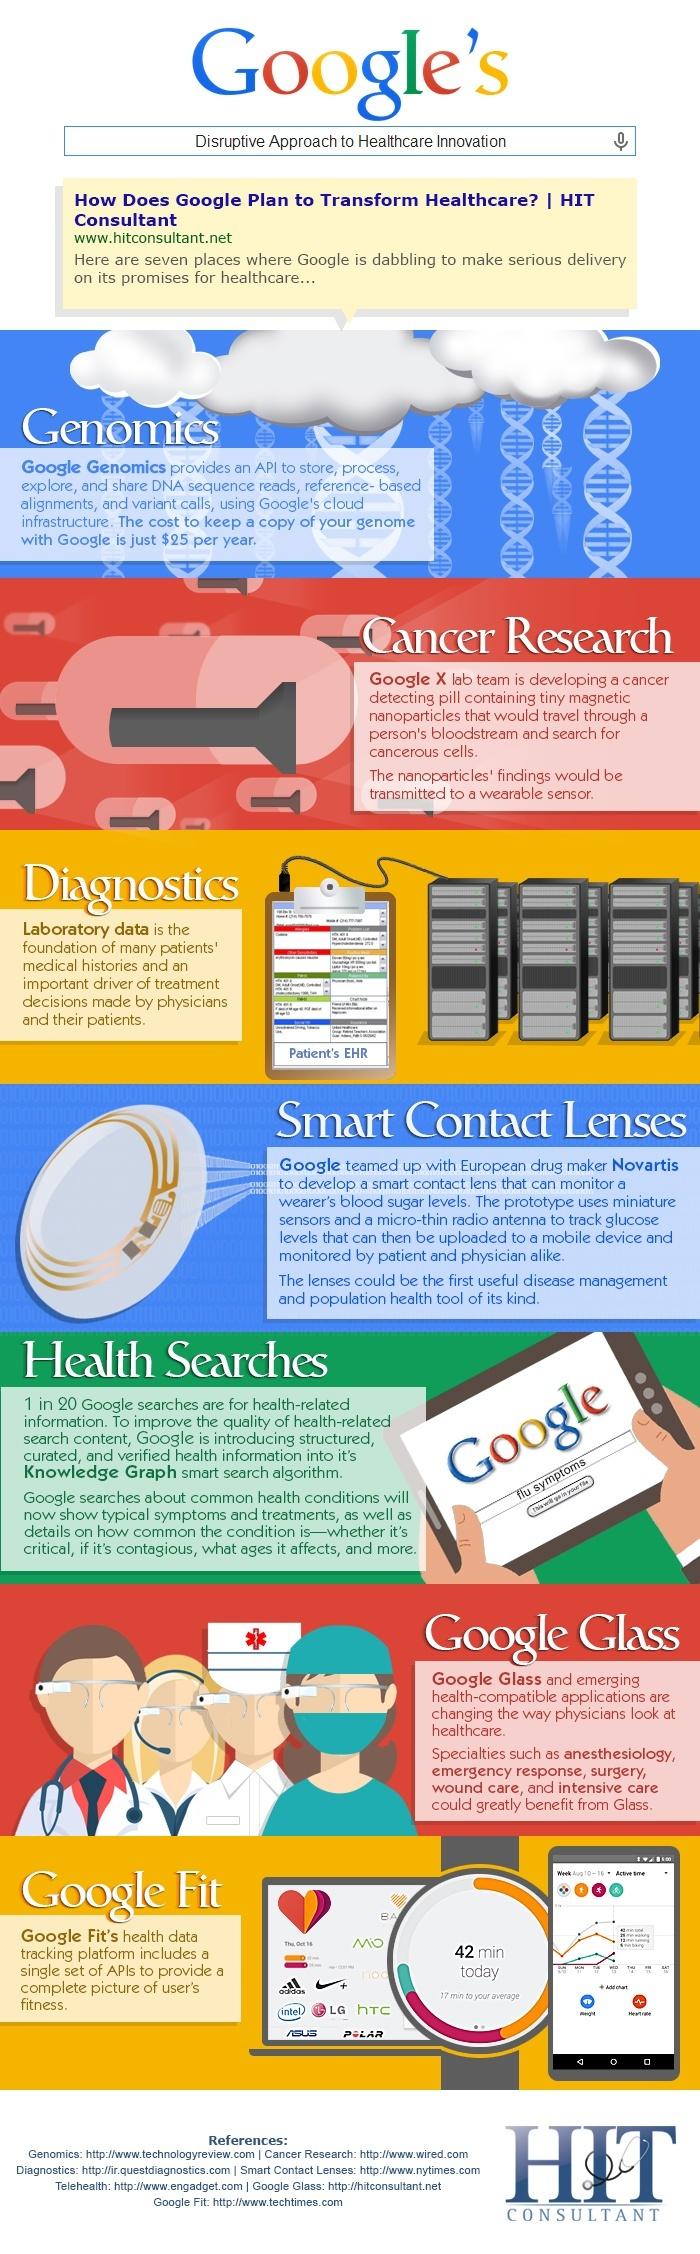 How Google Is Revolutionizing Healthcare